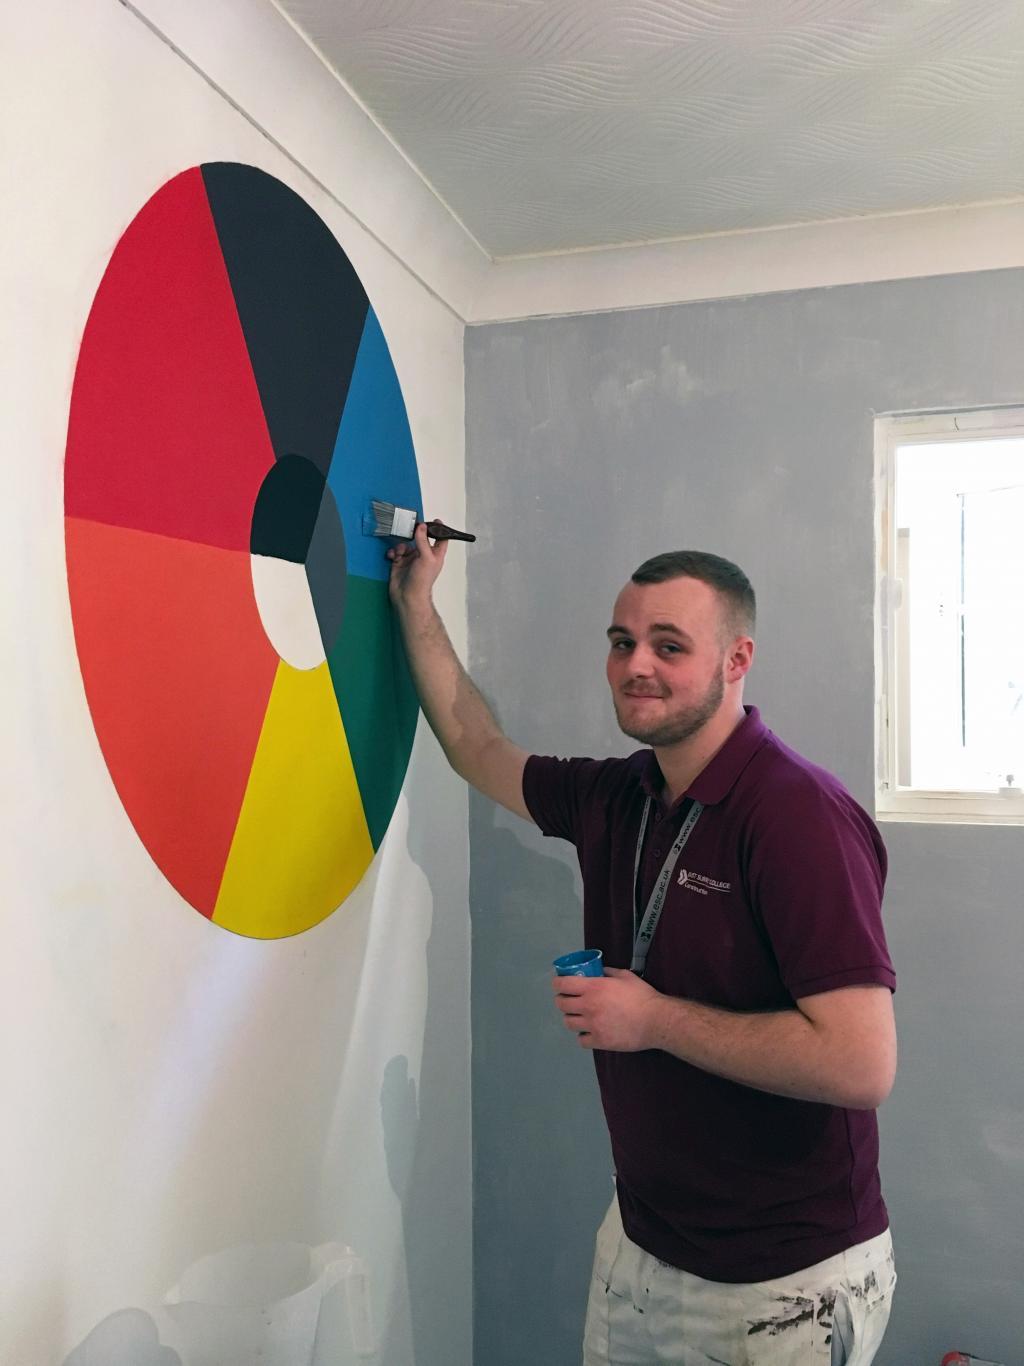 Painting & Decorating Level 2